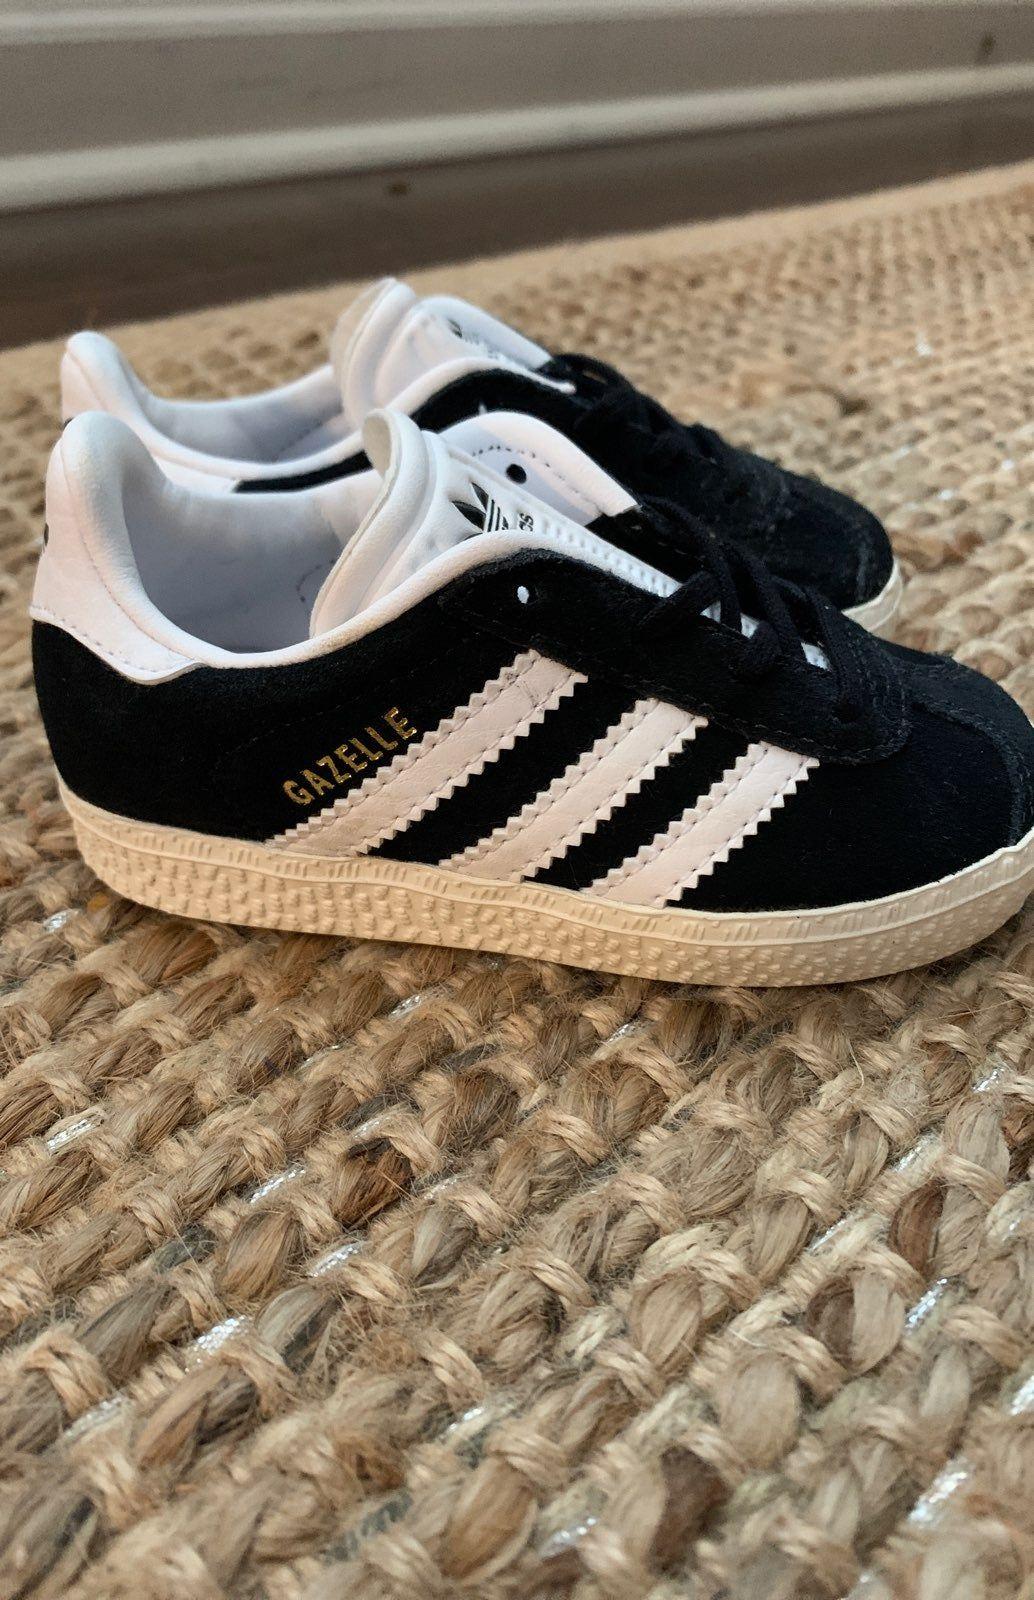 Black Adidas Gazelle tennis shoes size 5.5 kids shoes. No box ...